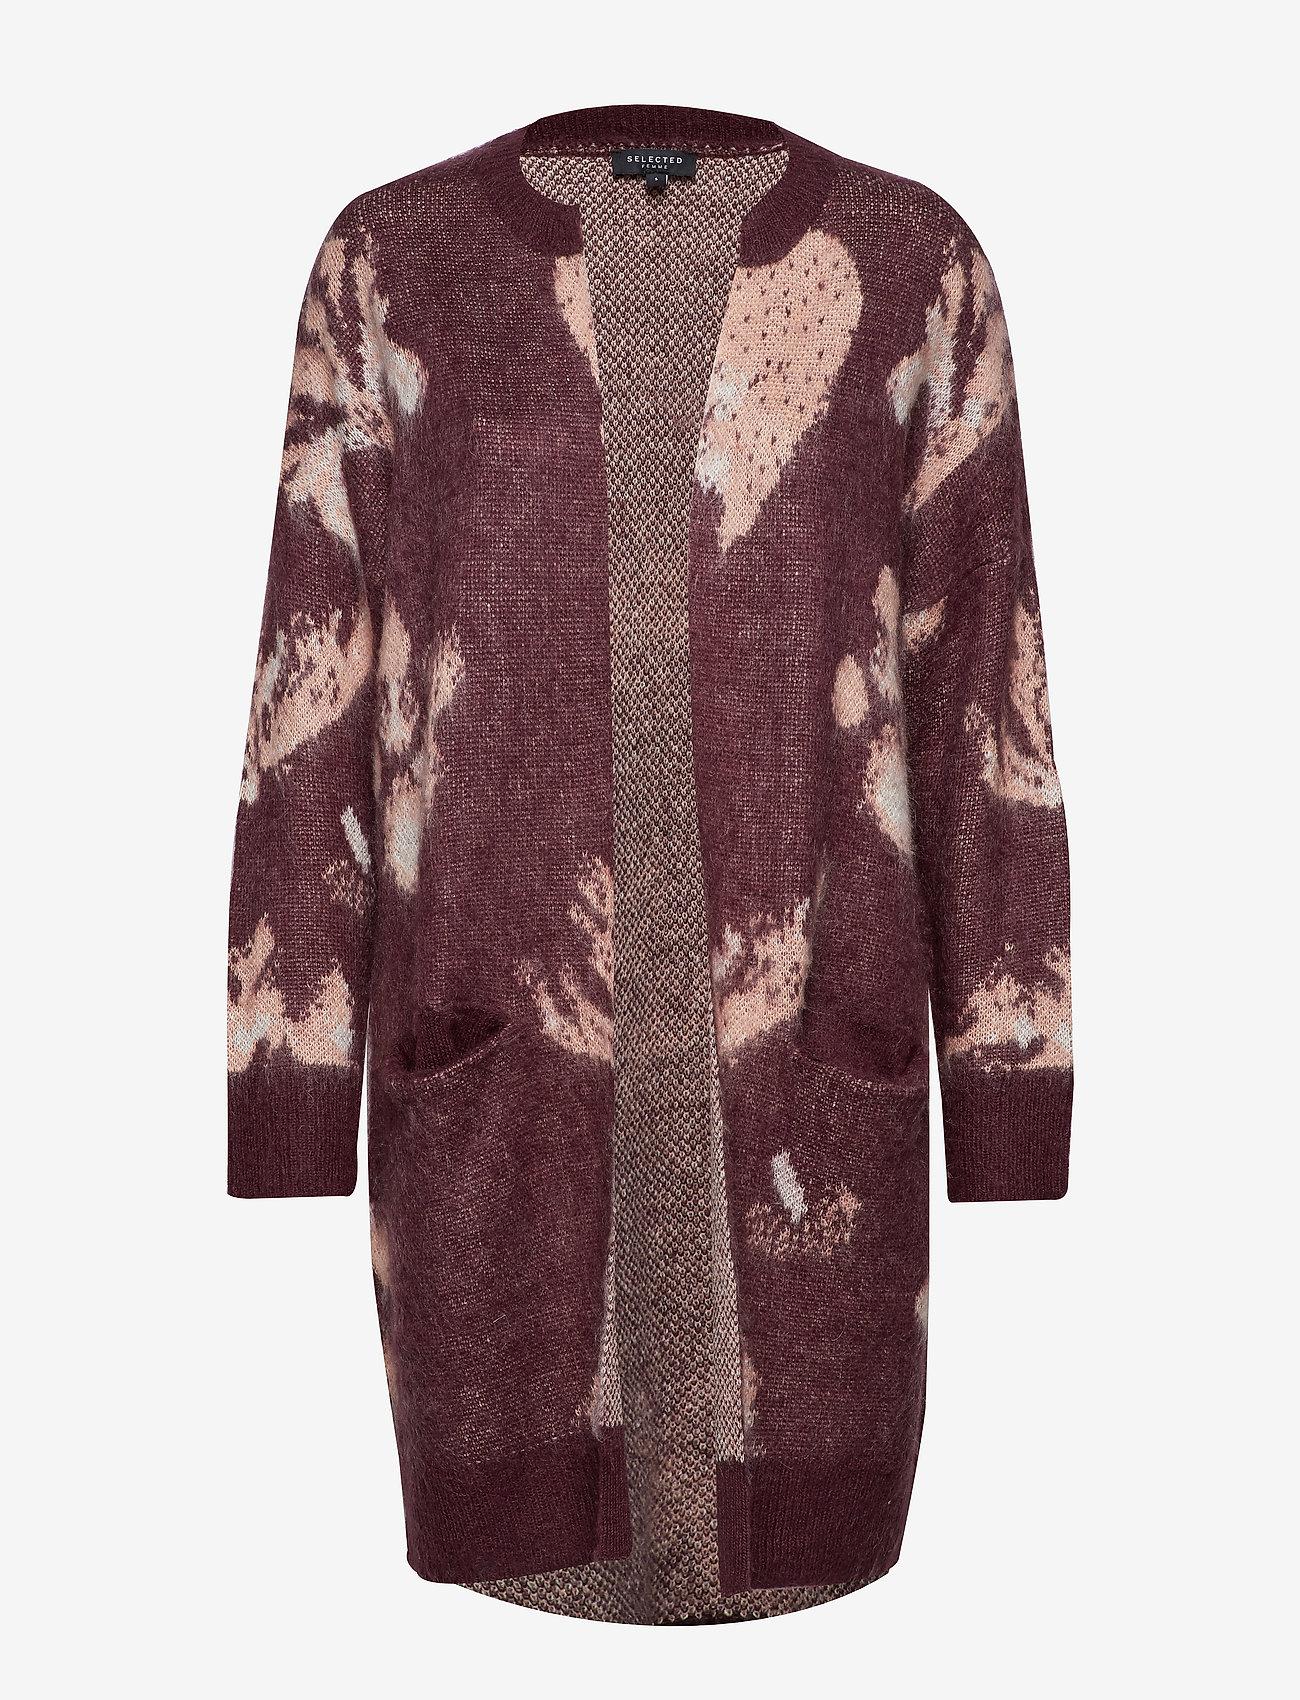 Selected Femme - SLFRILEY LS KNIT CARDIGAN B - cardigans - decadent chocolate